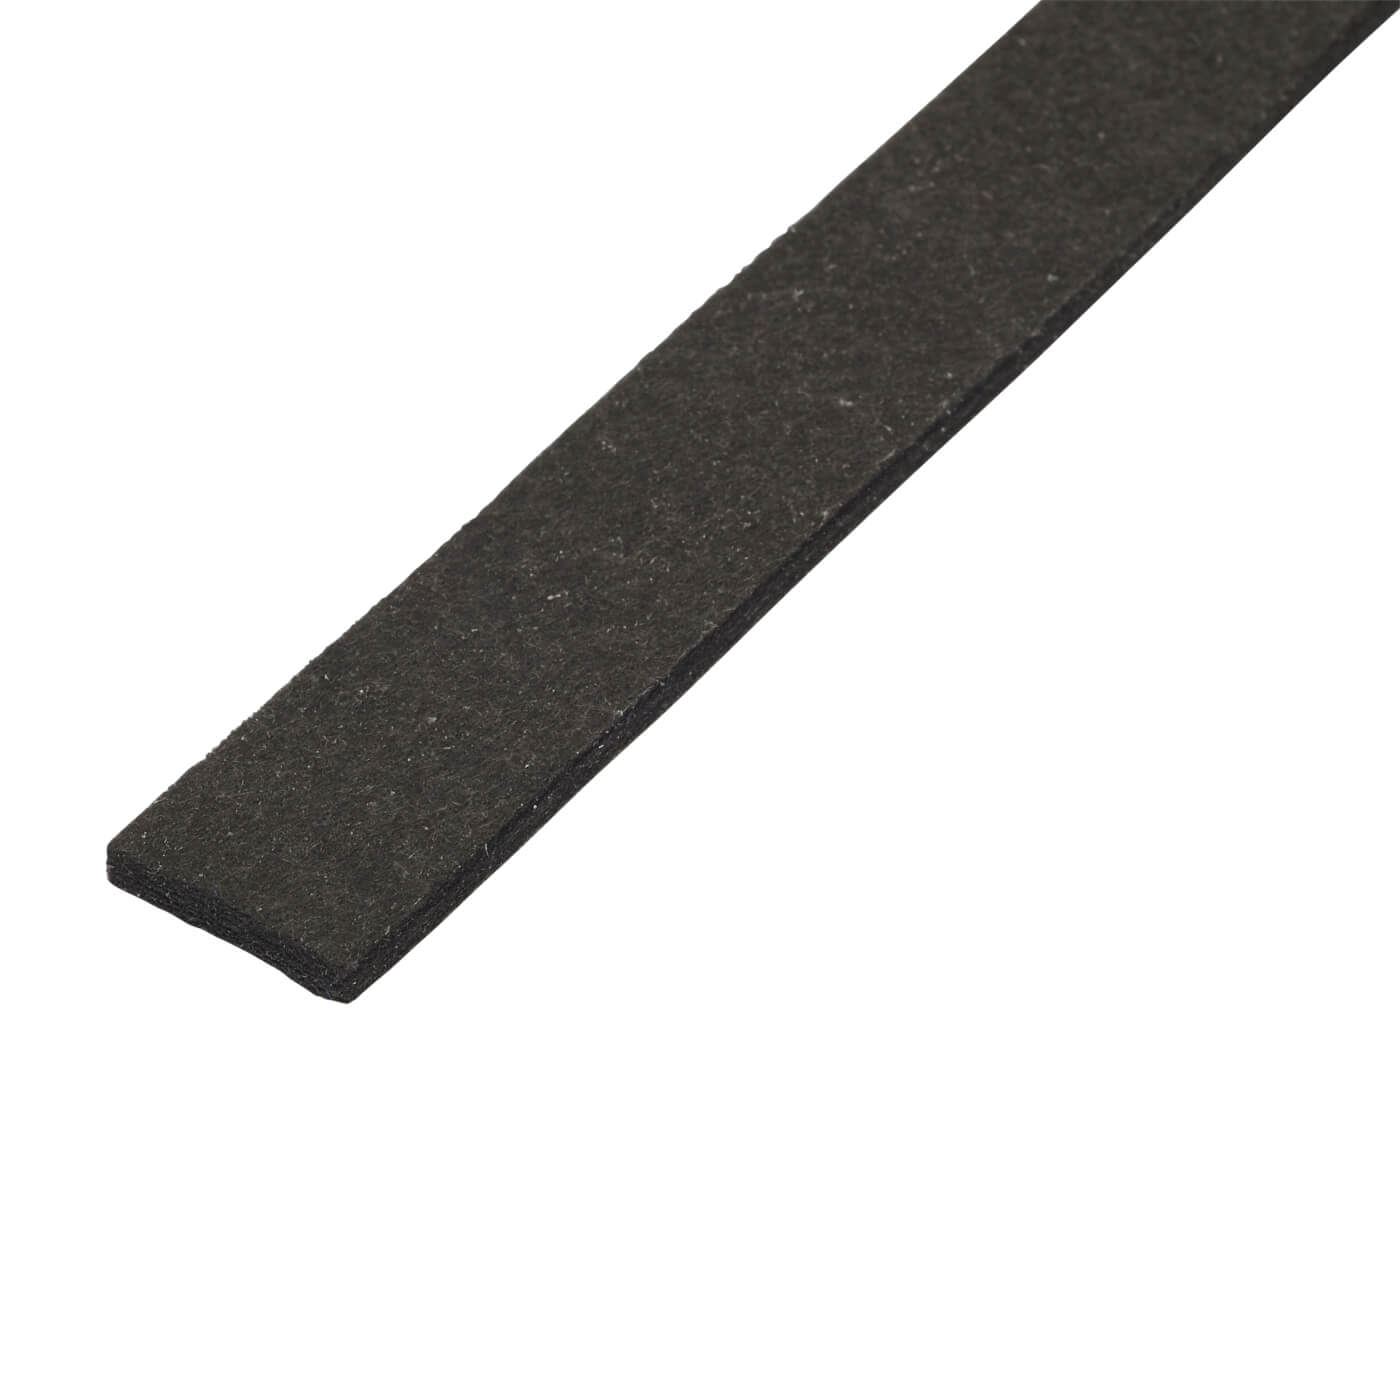 Sealmaster Fire Rated Glazing Tape - 20 x 4mm x 10m - Black)